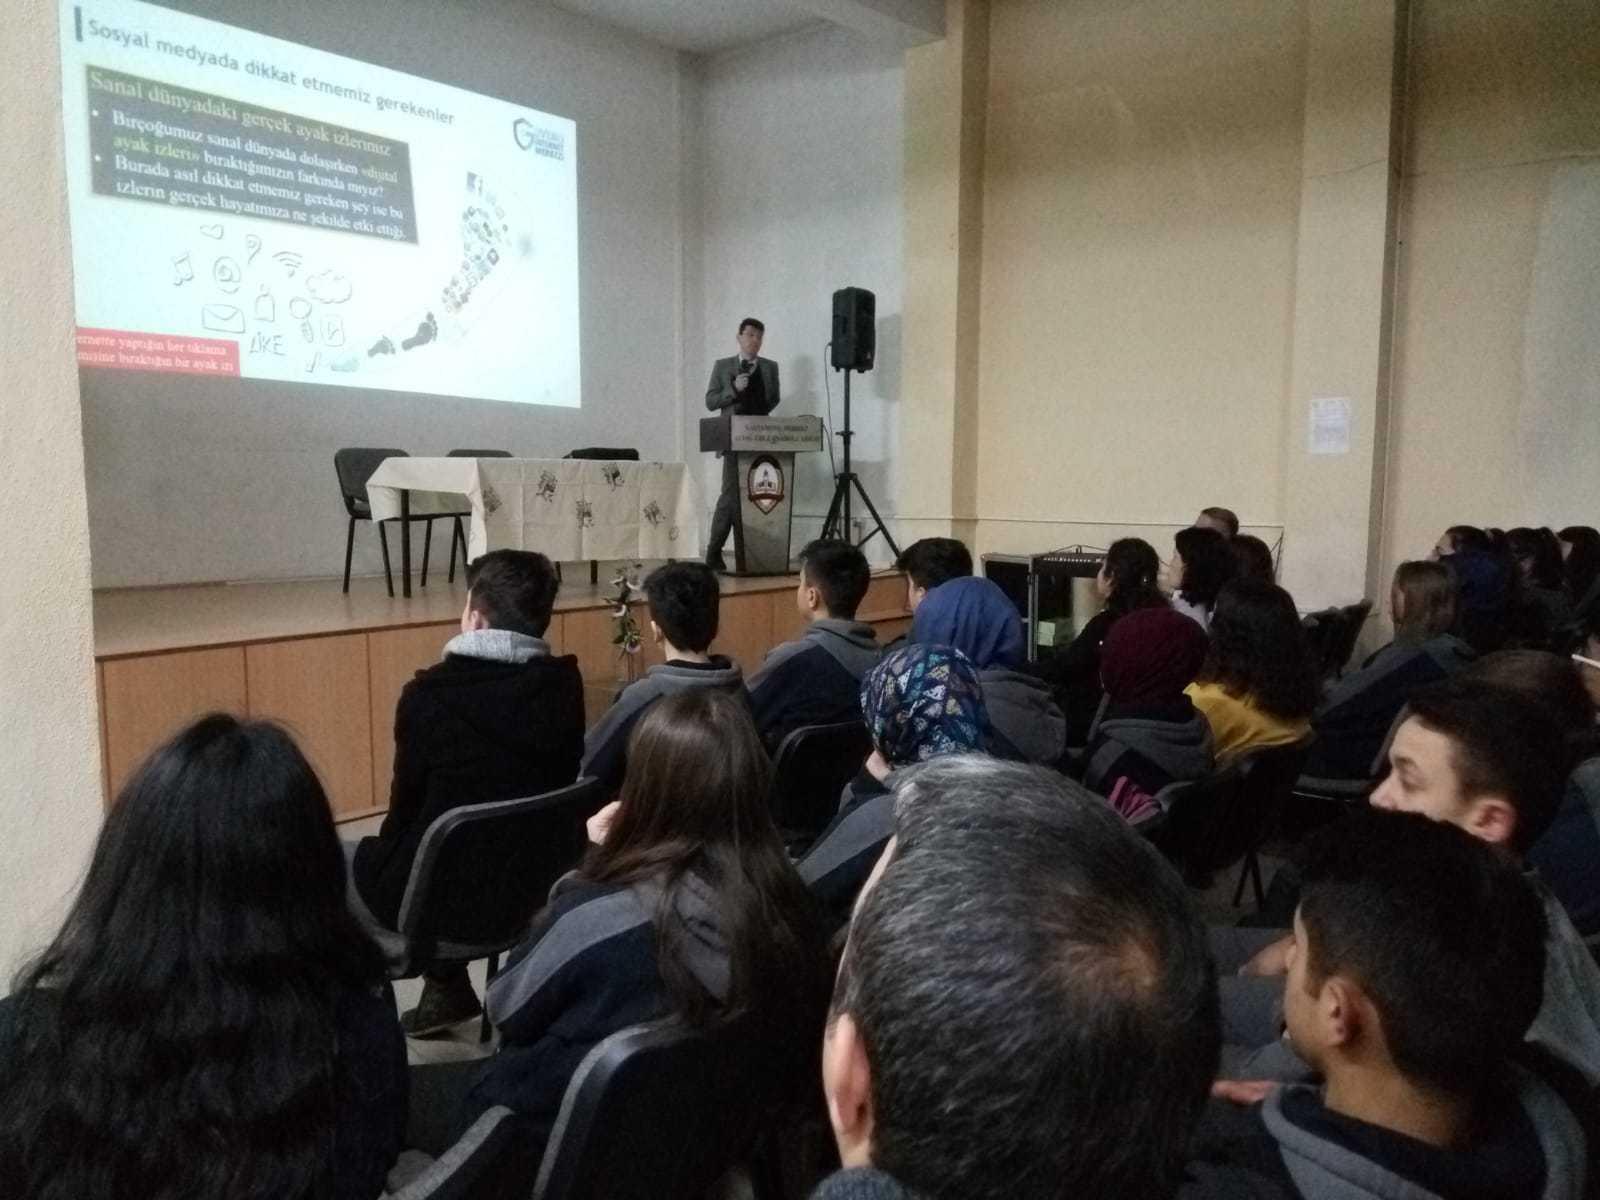 Kastamonu Mustafa Kaya Anadolu Lisesi, Bilinçli Ve Güvenli İnternet Semineri